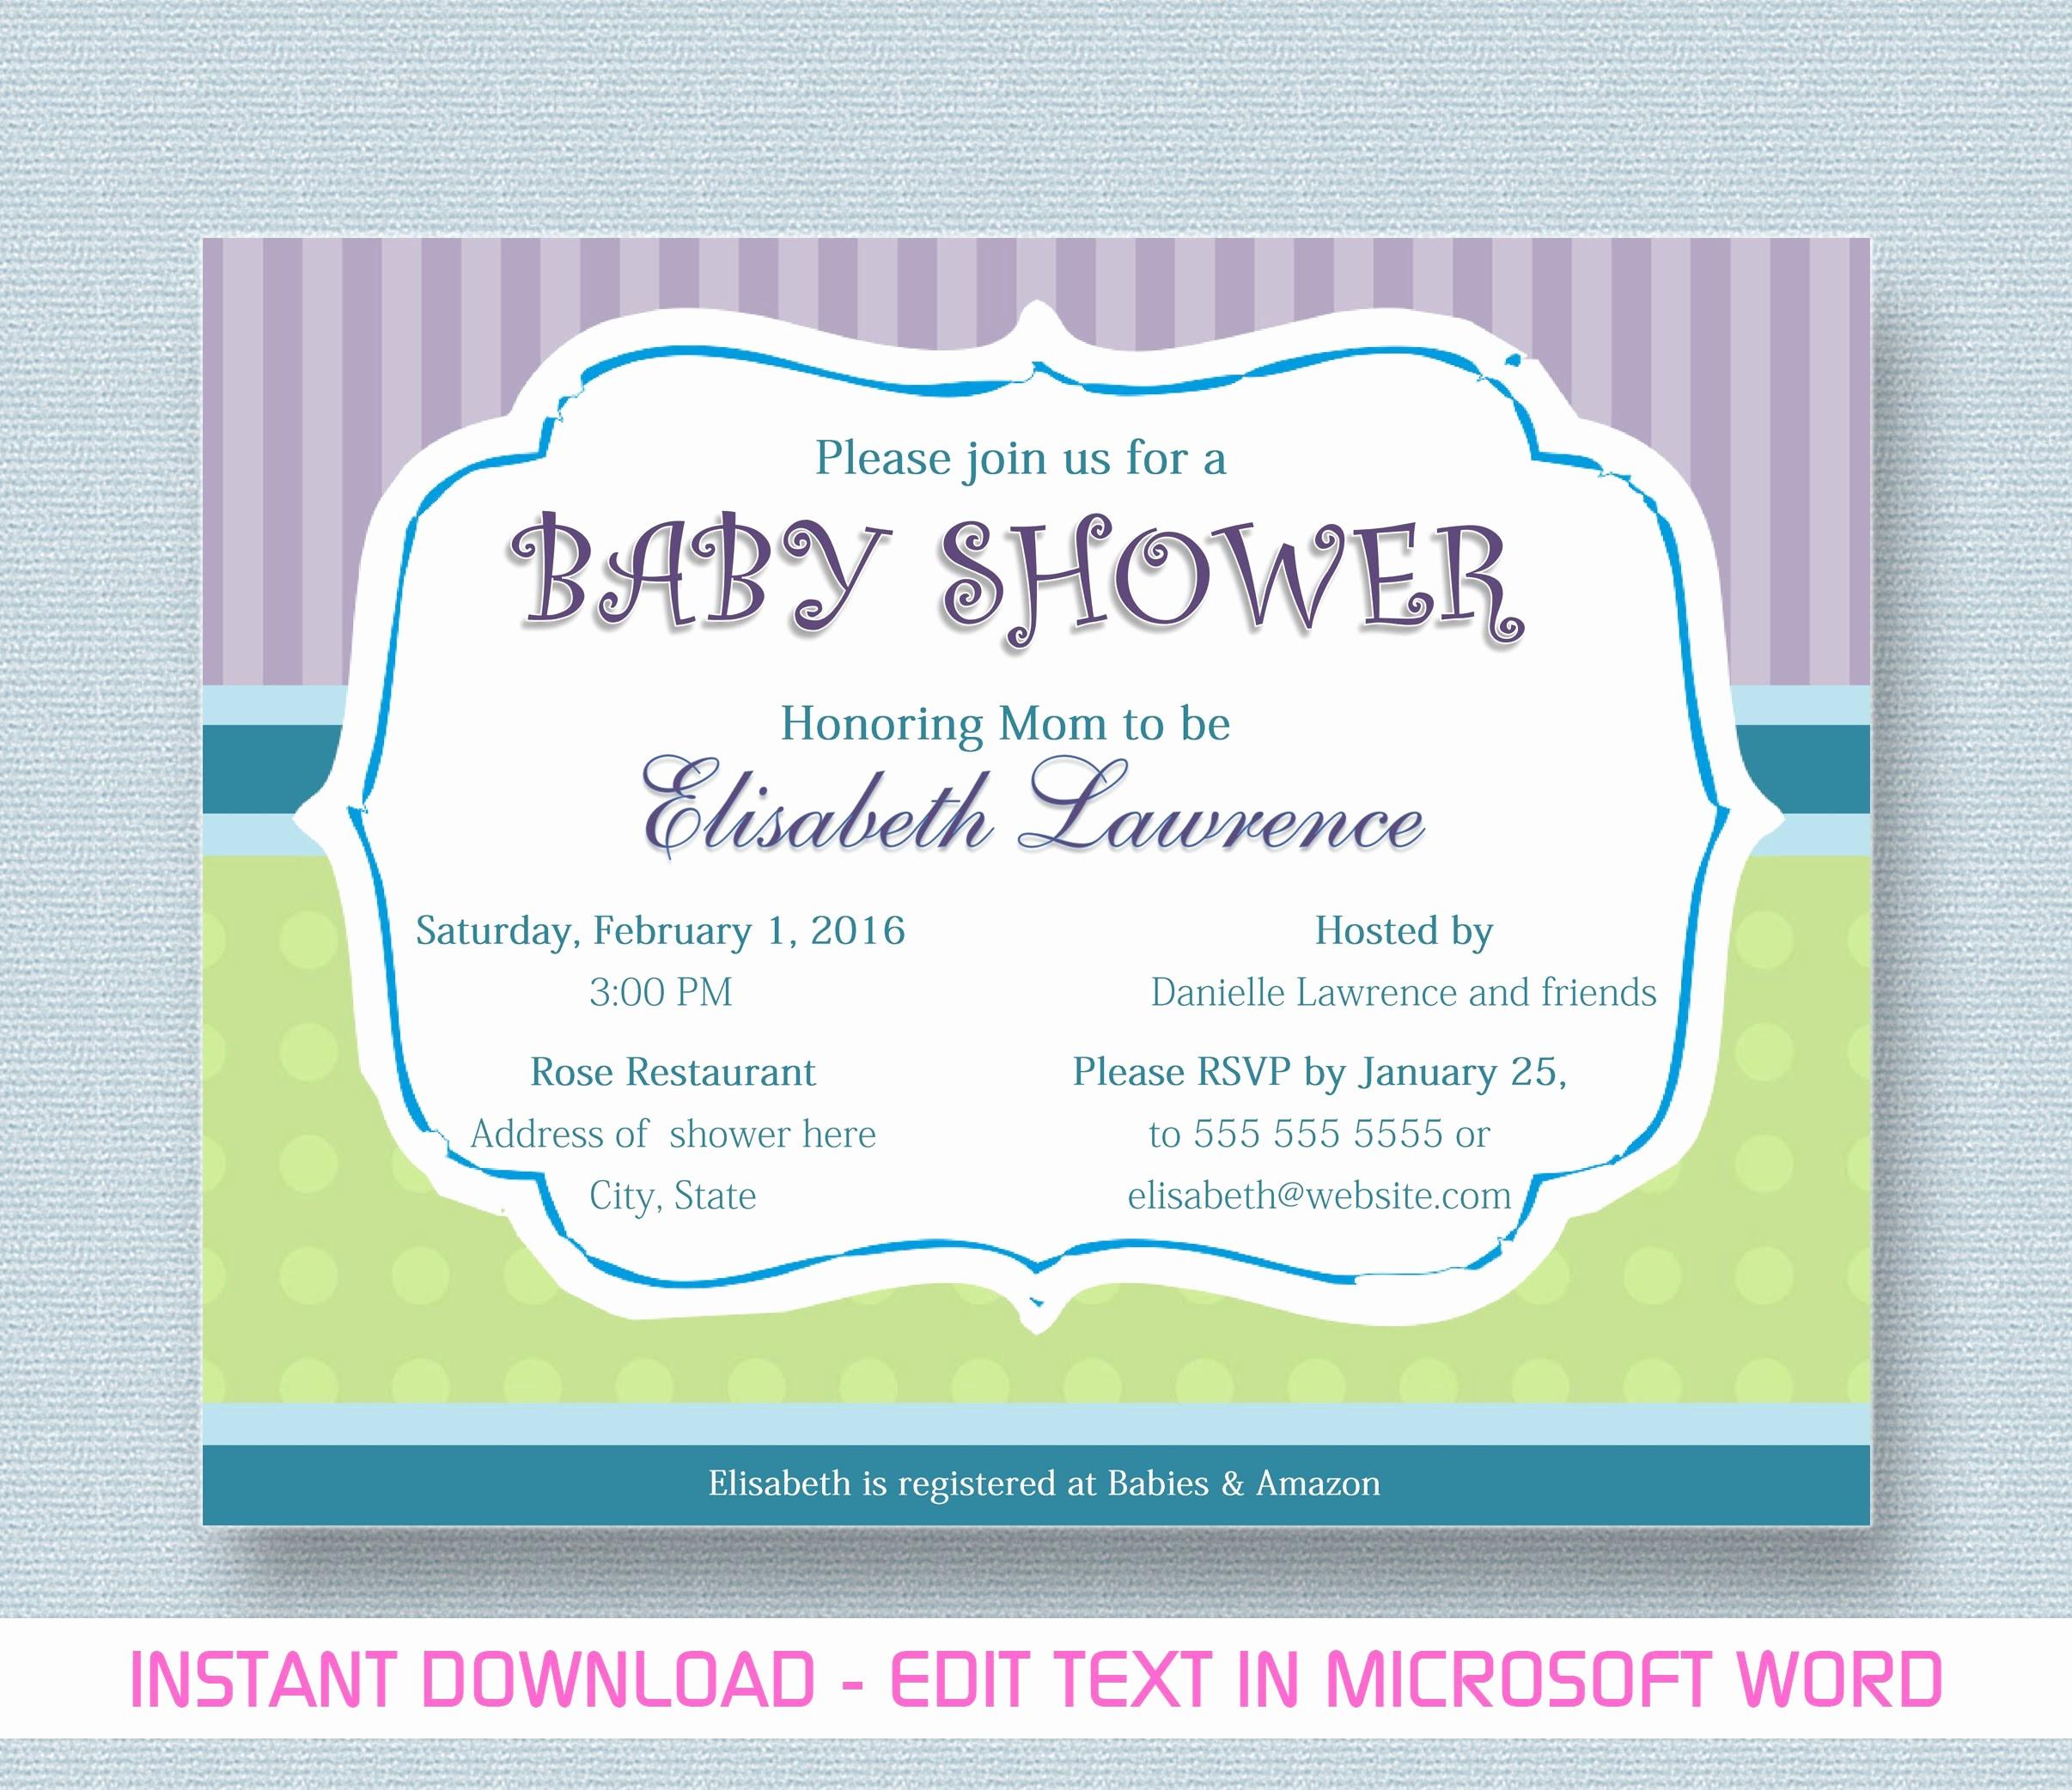 Making Invitations On Microsoft Word Inspirational Baby Shower Invitation for Microsoft Word